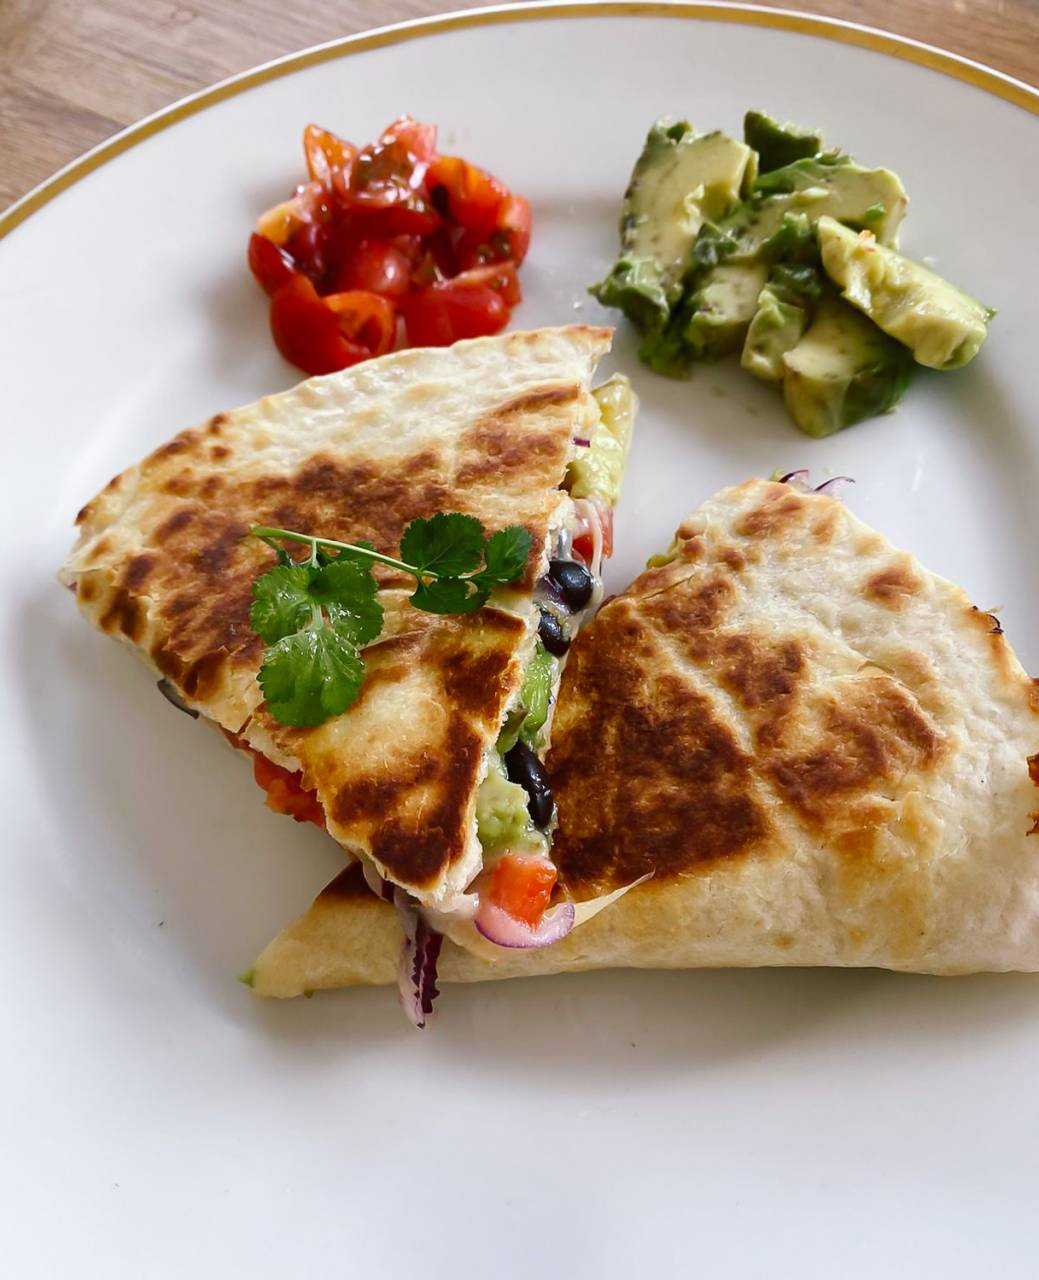 Quesadilla recipe from Mexico